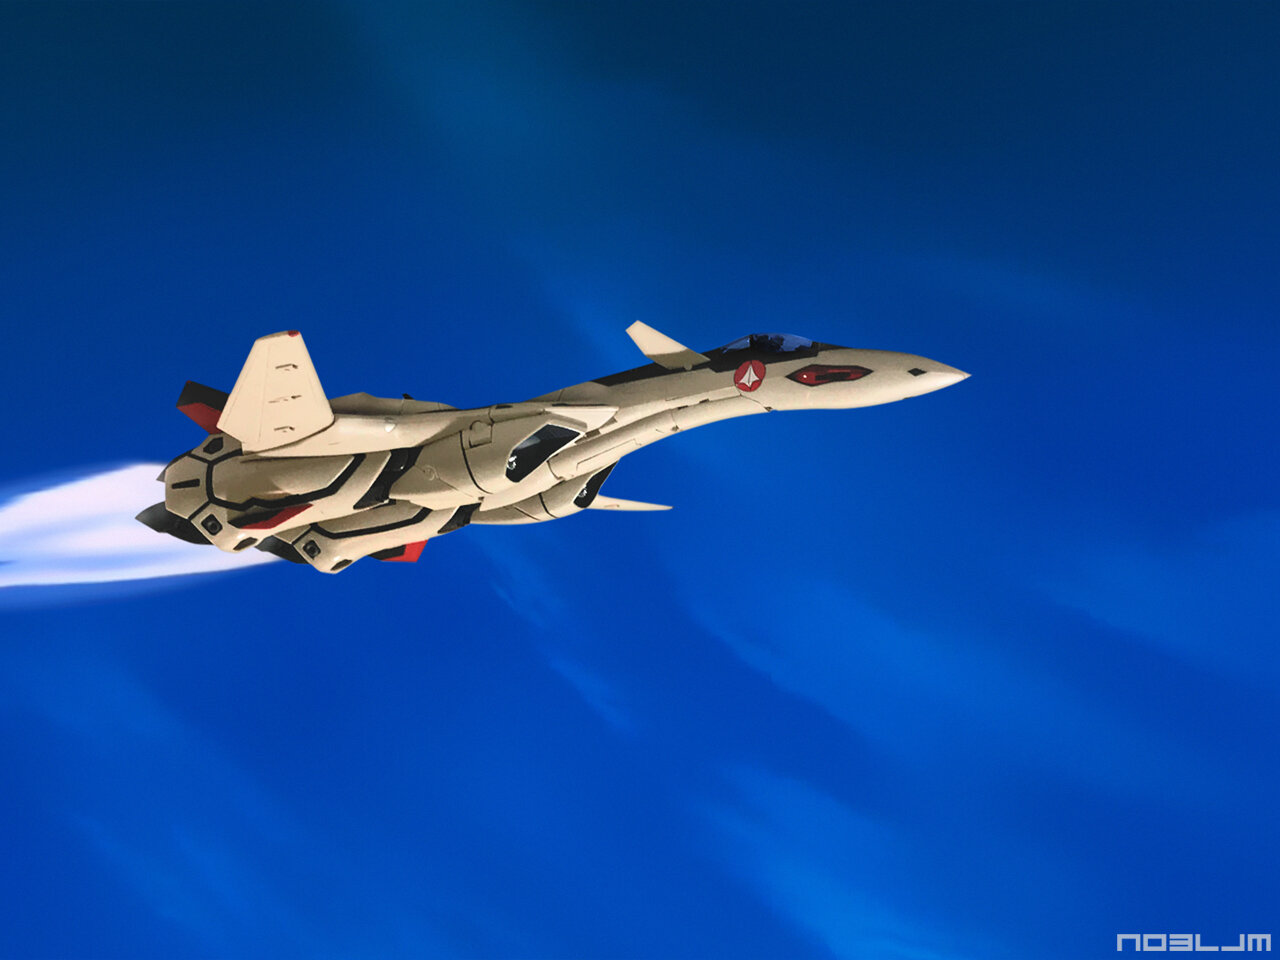 Arcadia_YF-19_Flight-Test_02.jpg.7b2caf74f6993f6119ebd9966b4f2c60.jpg